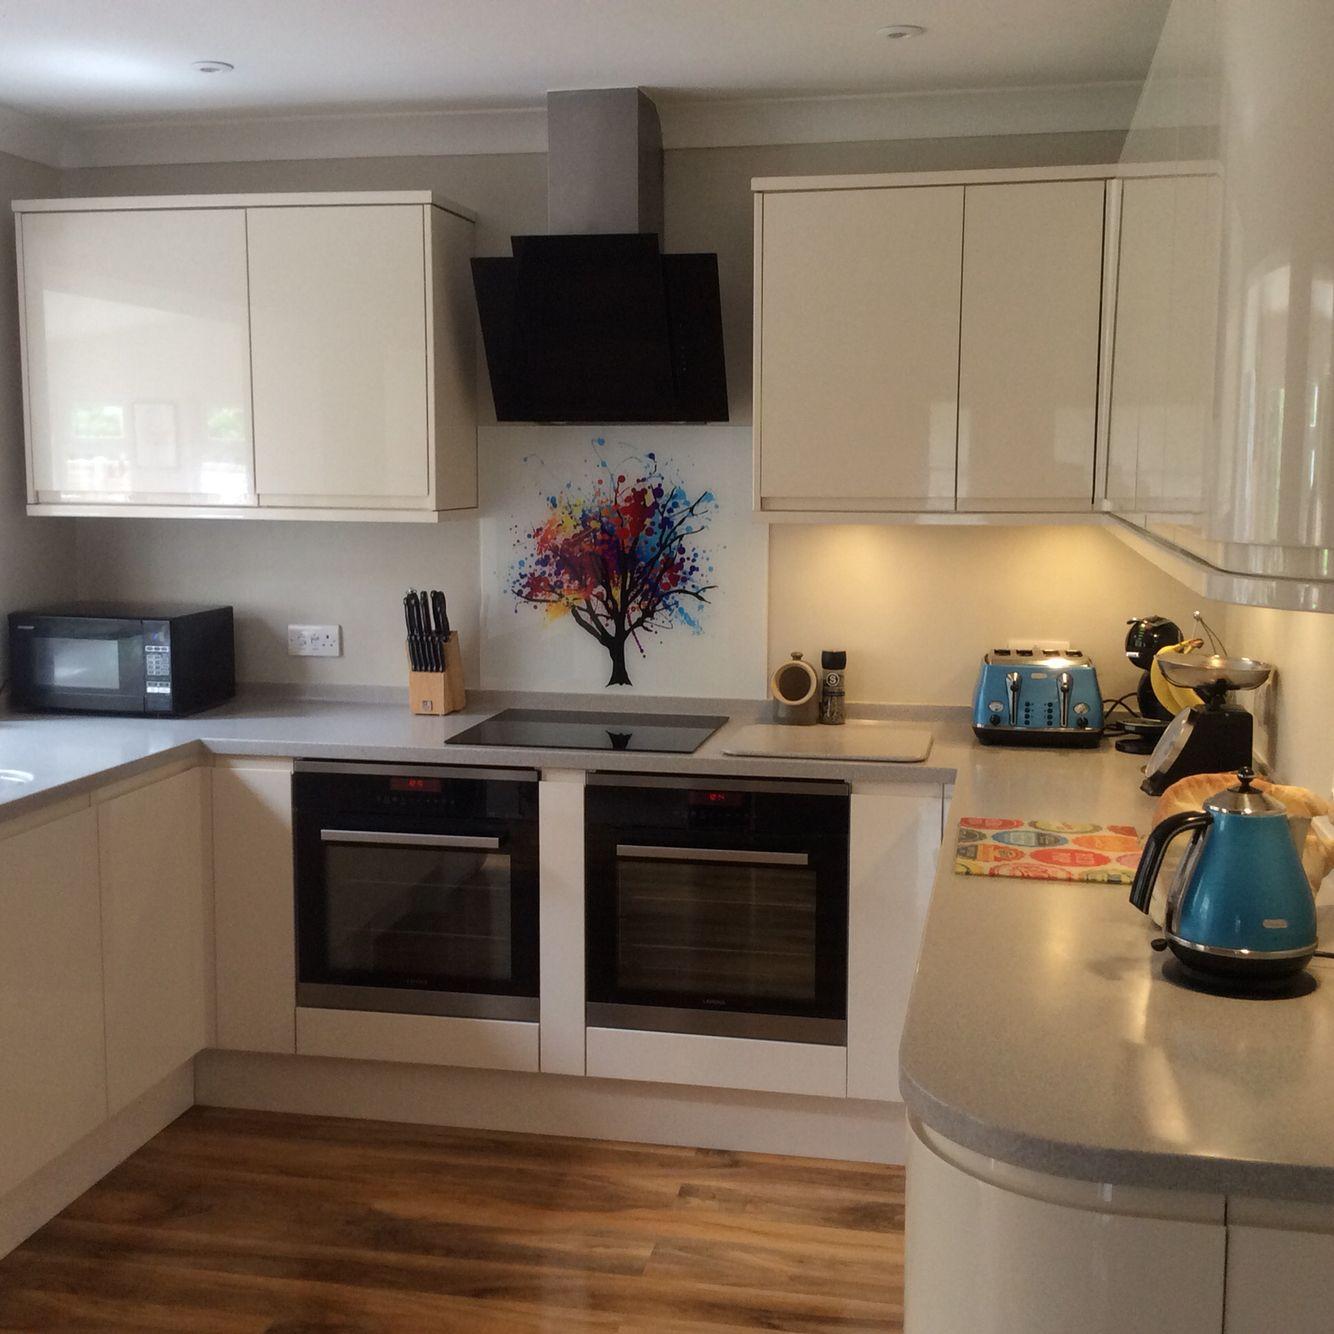 Kitchen Design And Fitting Rainbow Tree Glass Cooker Splashback Glass Splashbacks Are The